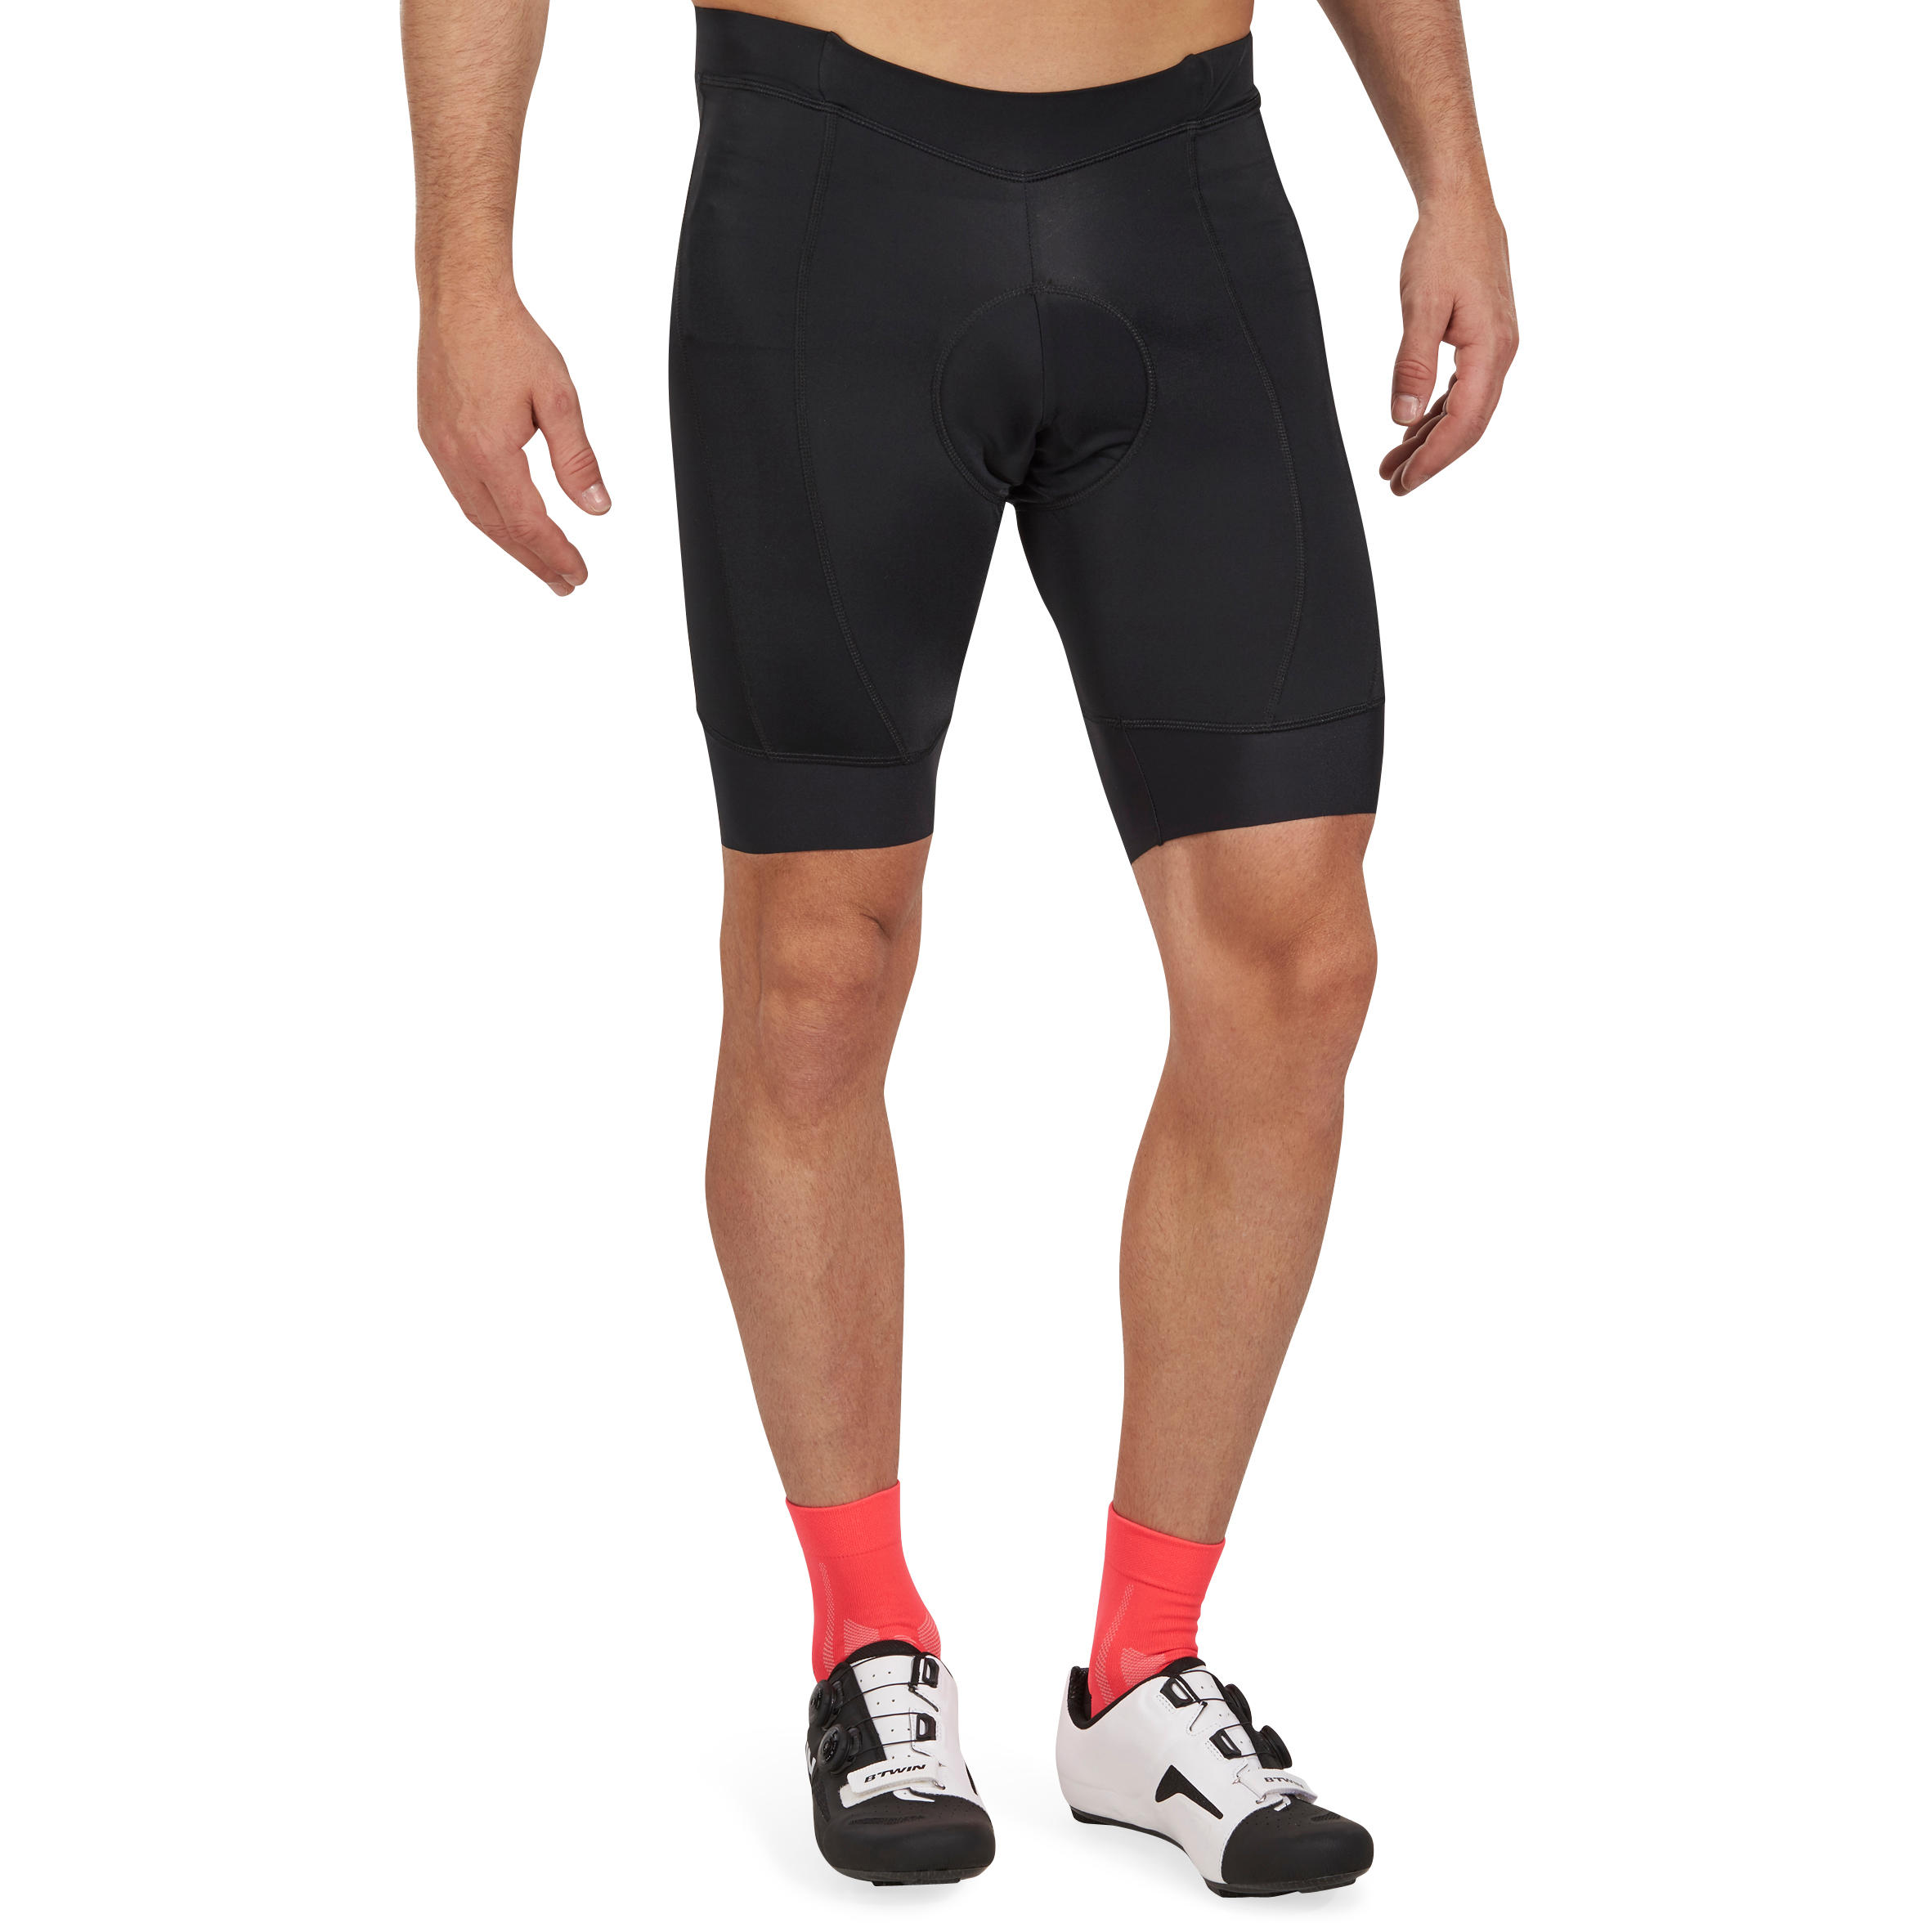 Roadcycling 900 Bibless Cycling Shorts - Black